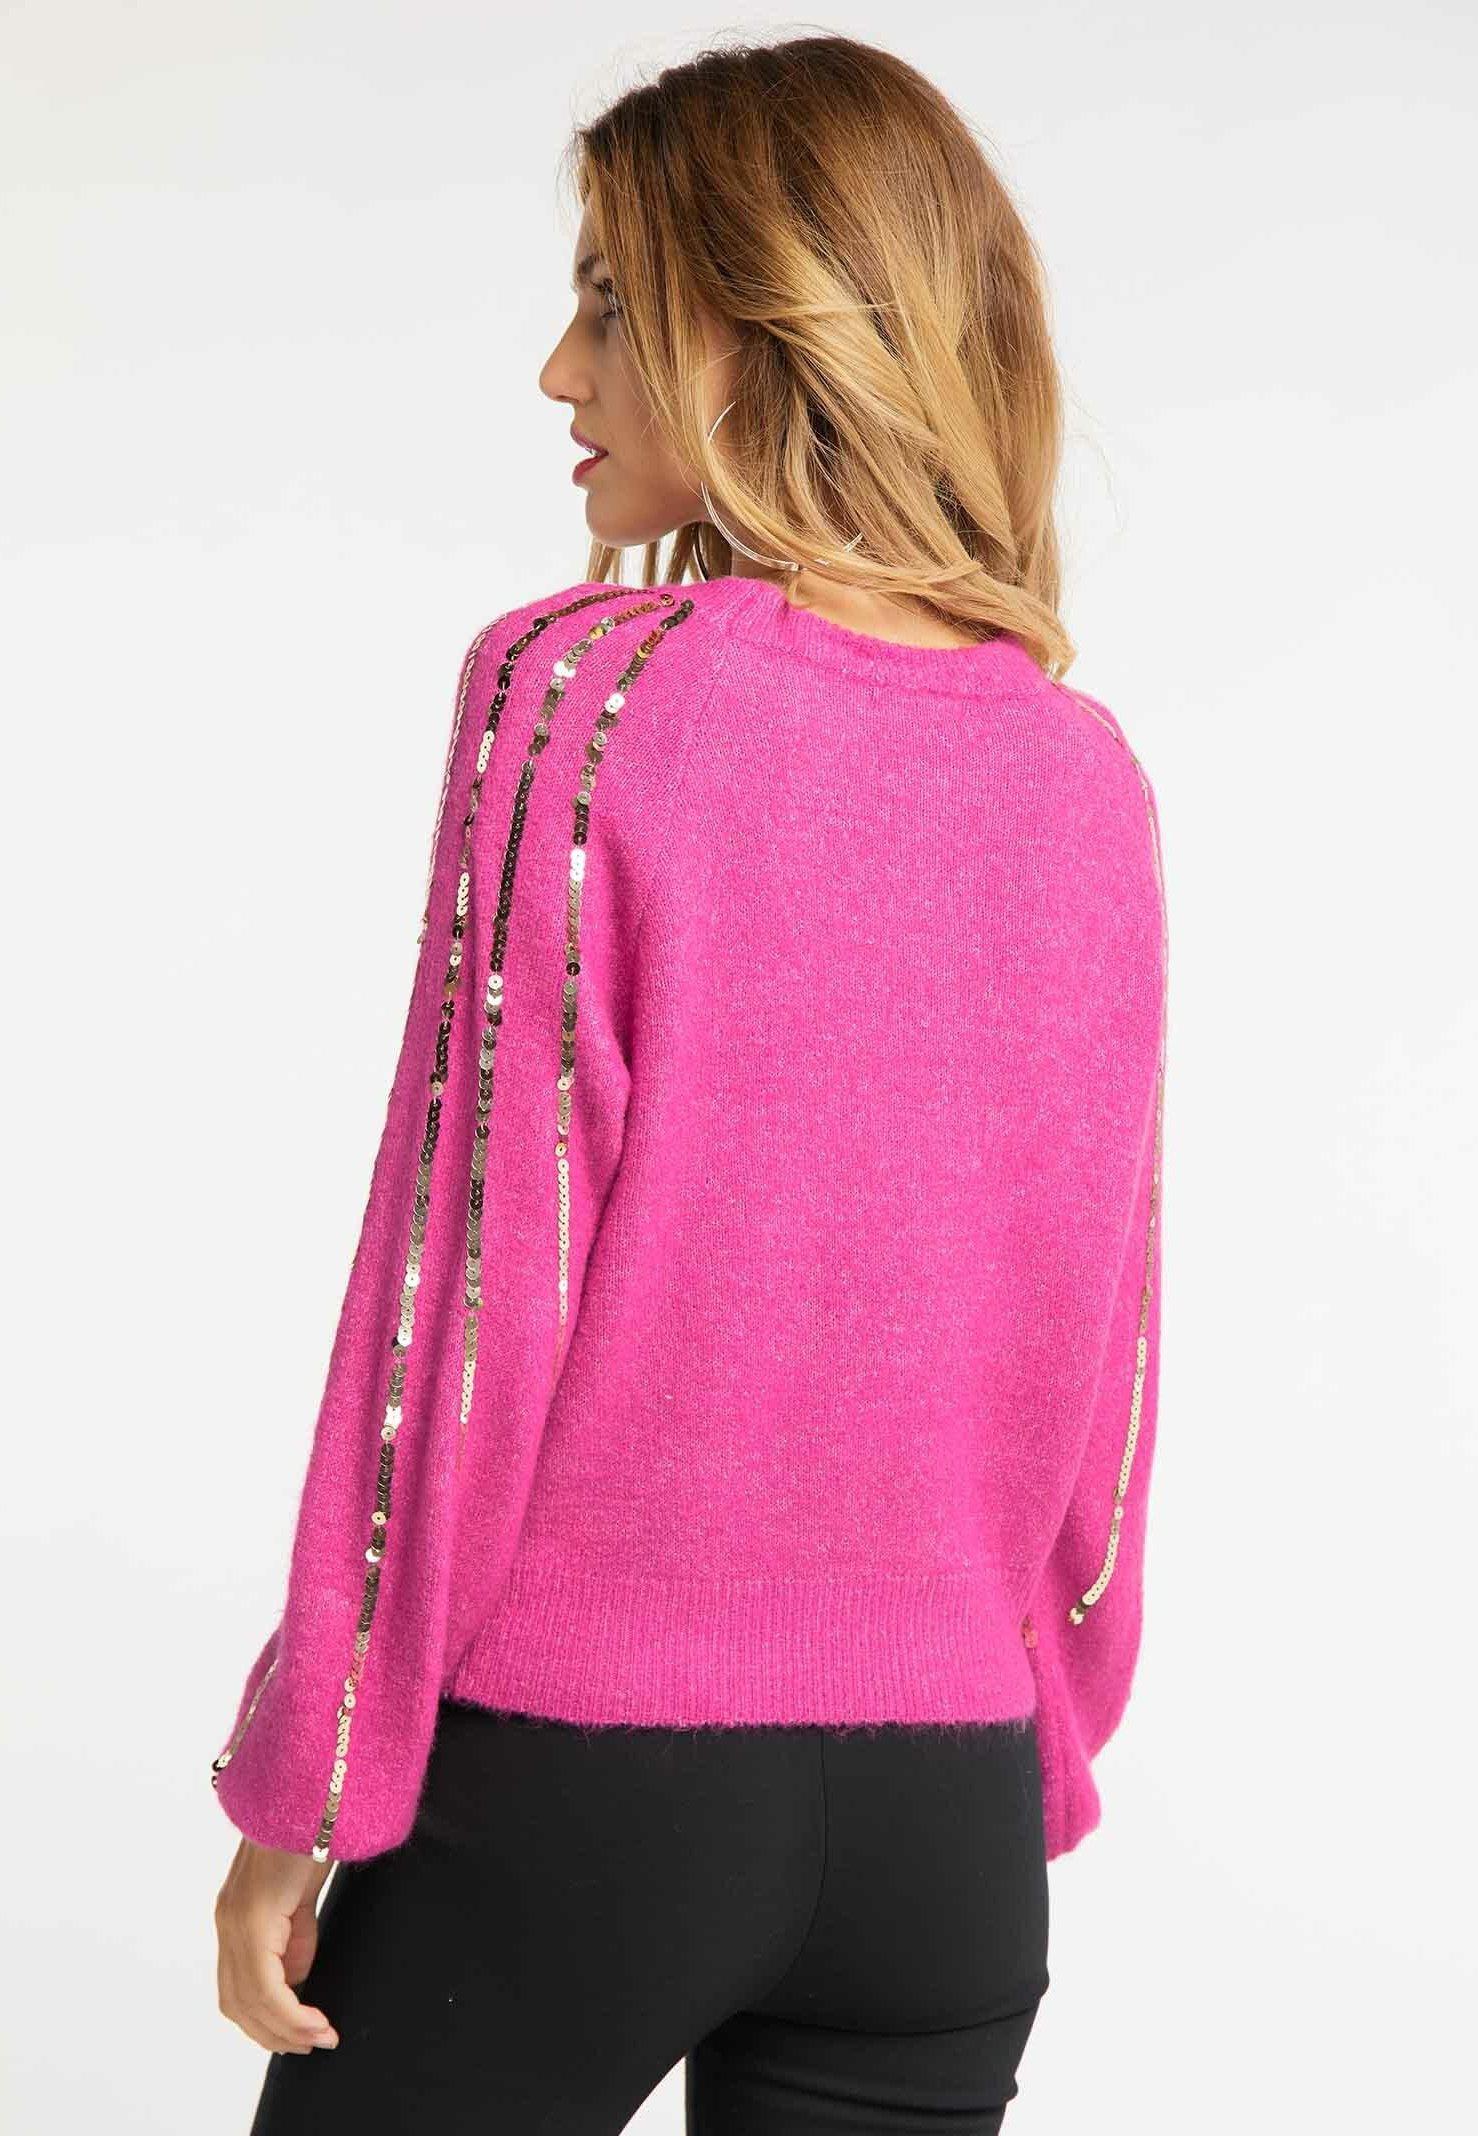 Great Deals Women's Clothing faina Jumper pink st4h7pOJl